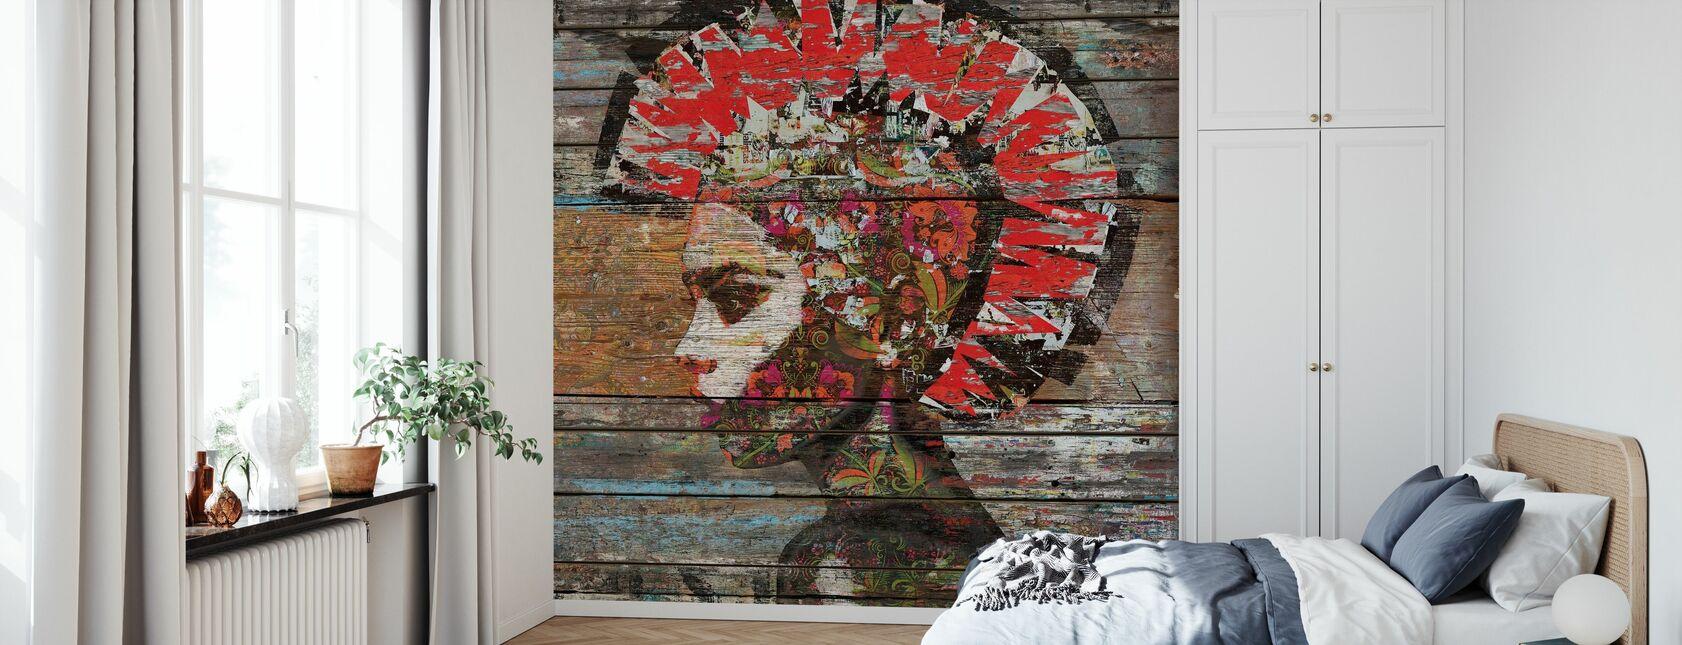 Wild Nature - Profile of Woman - Wallpaper - Bedroom